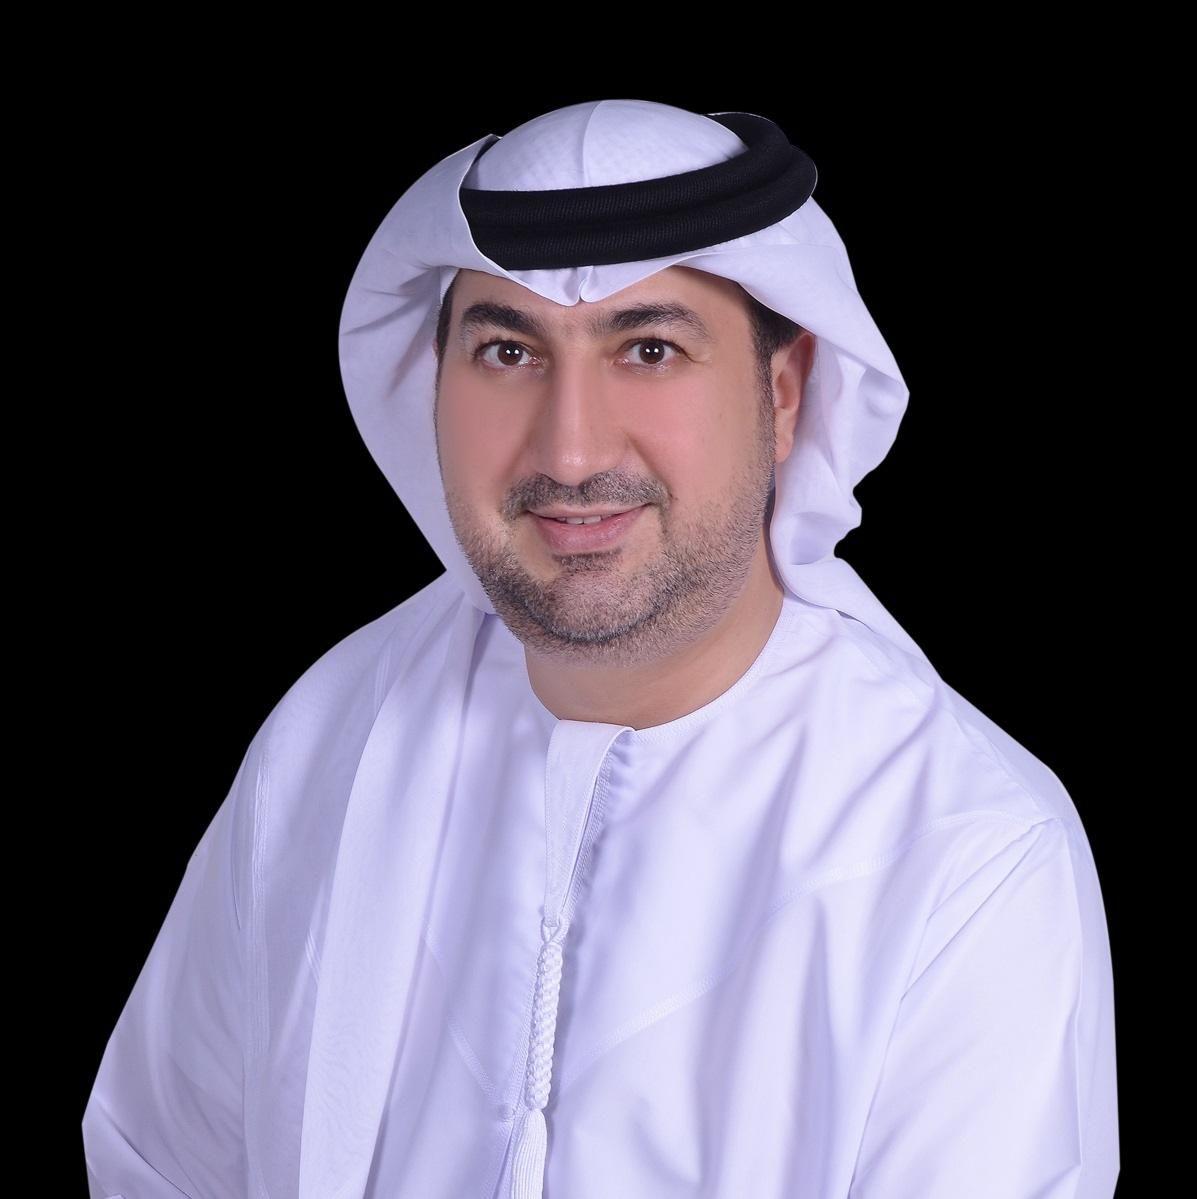 Adel Al Tamimi